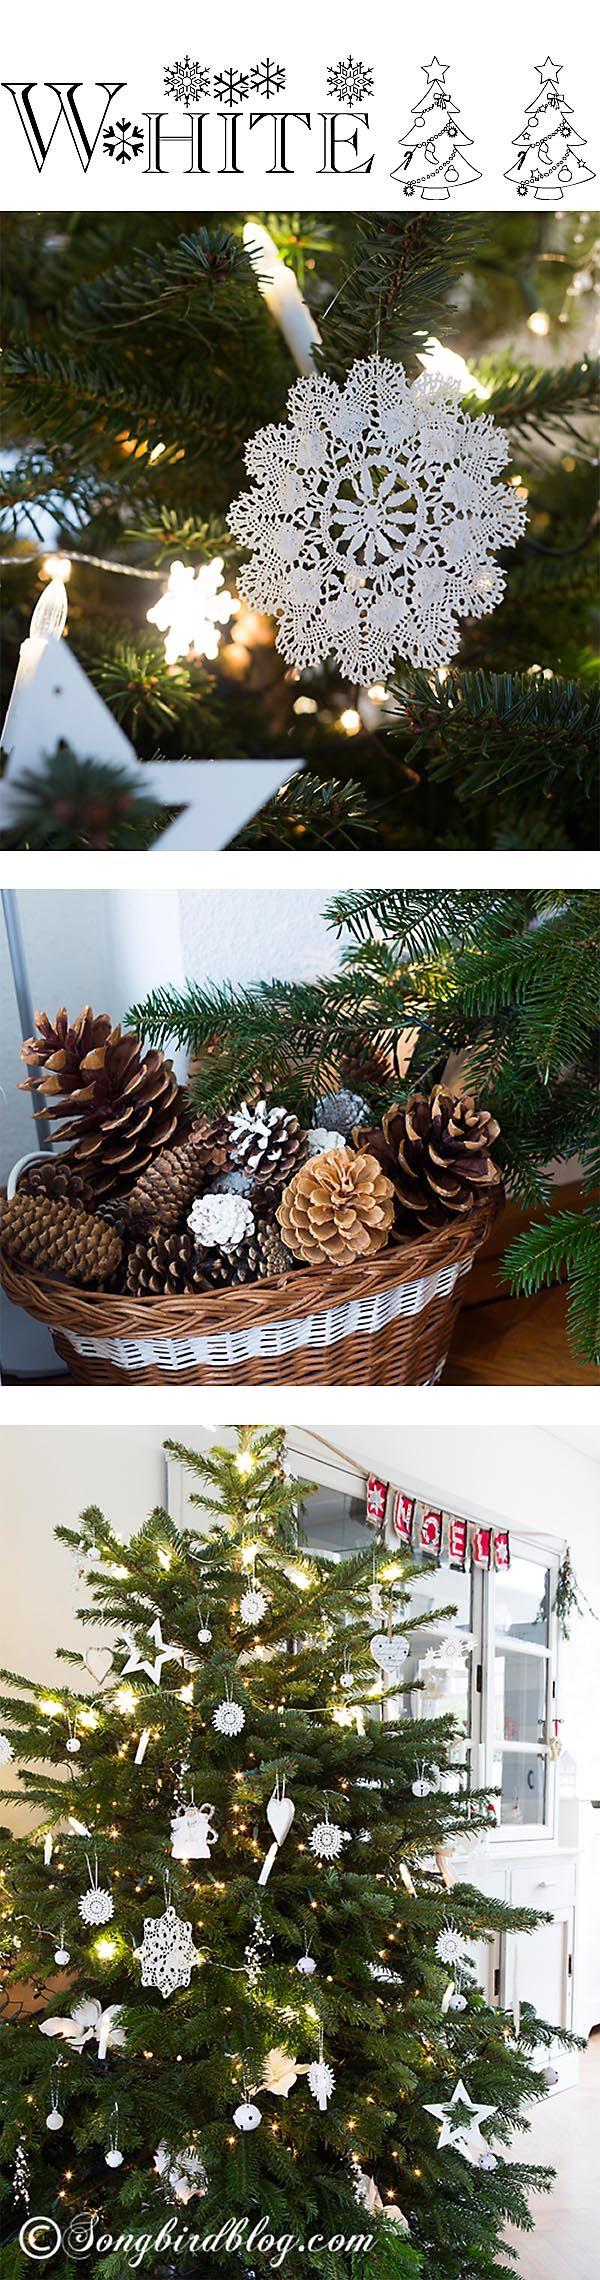 Nordic, Scandinavian Christmas tree with all white ornaments, like handmade crochet snowflakes and wooden stars. Via http://www.songbirdblog.com